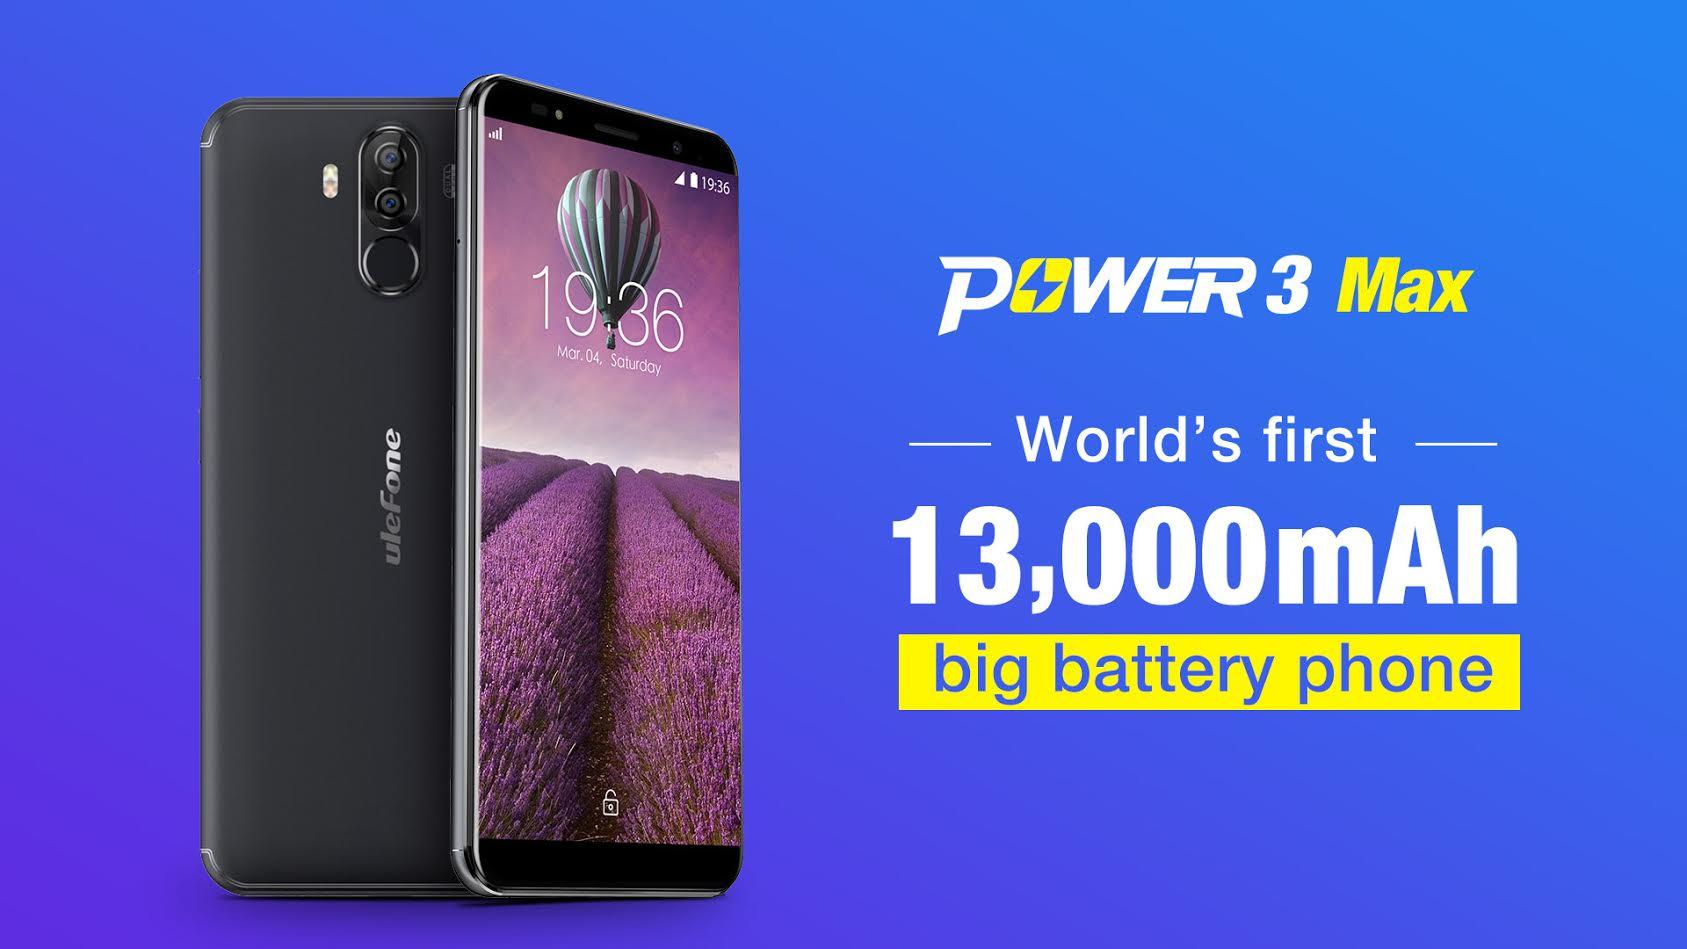 Power 3 Max – telefon s kapacitou baterie 13 000 mAh v přípravě [sponzorovaný článek]